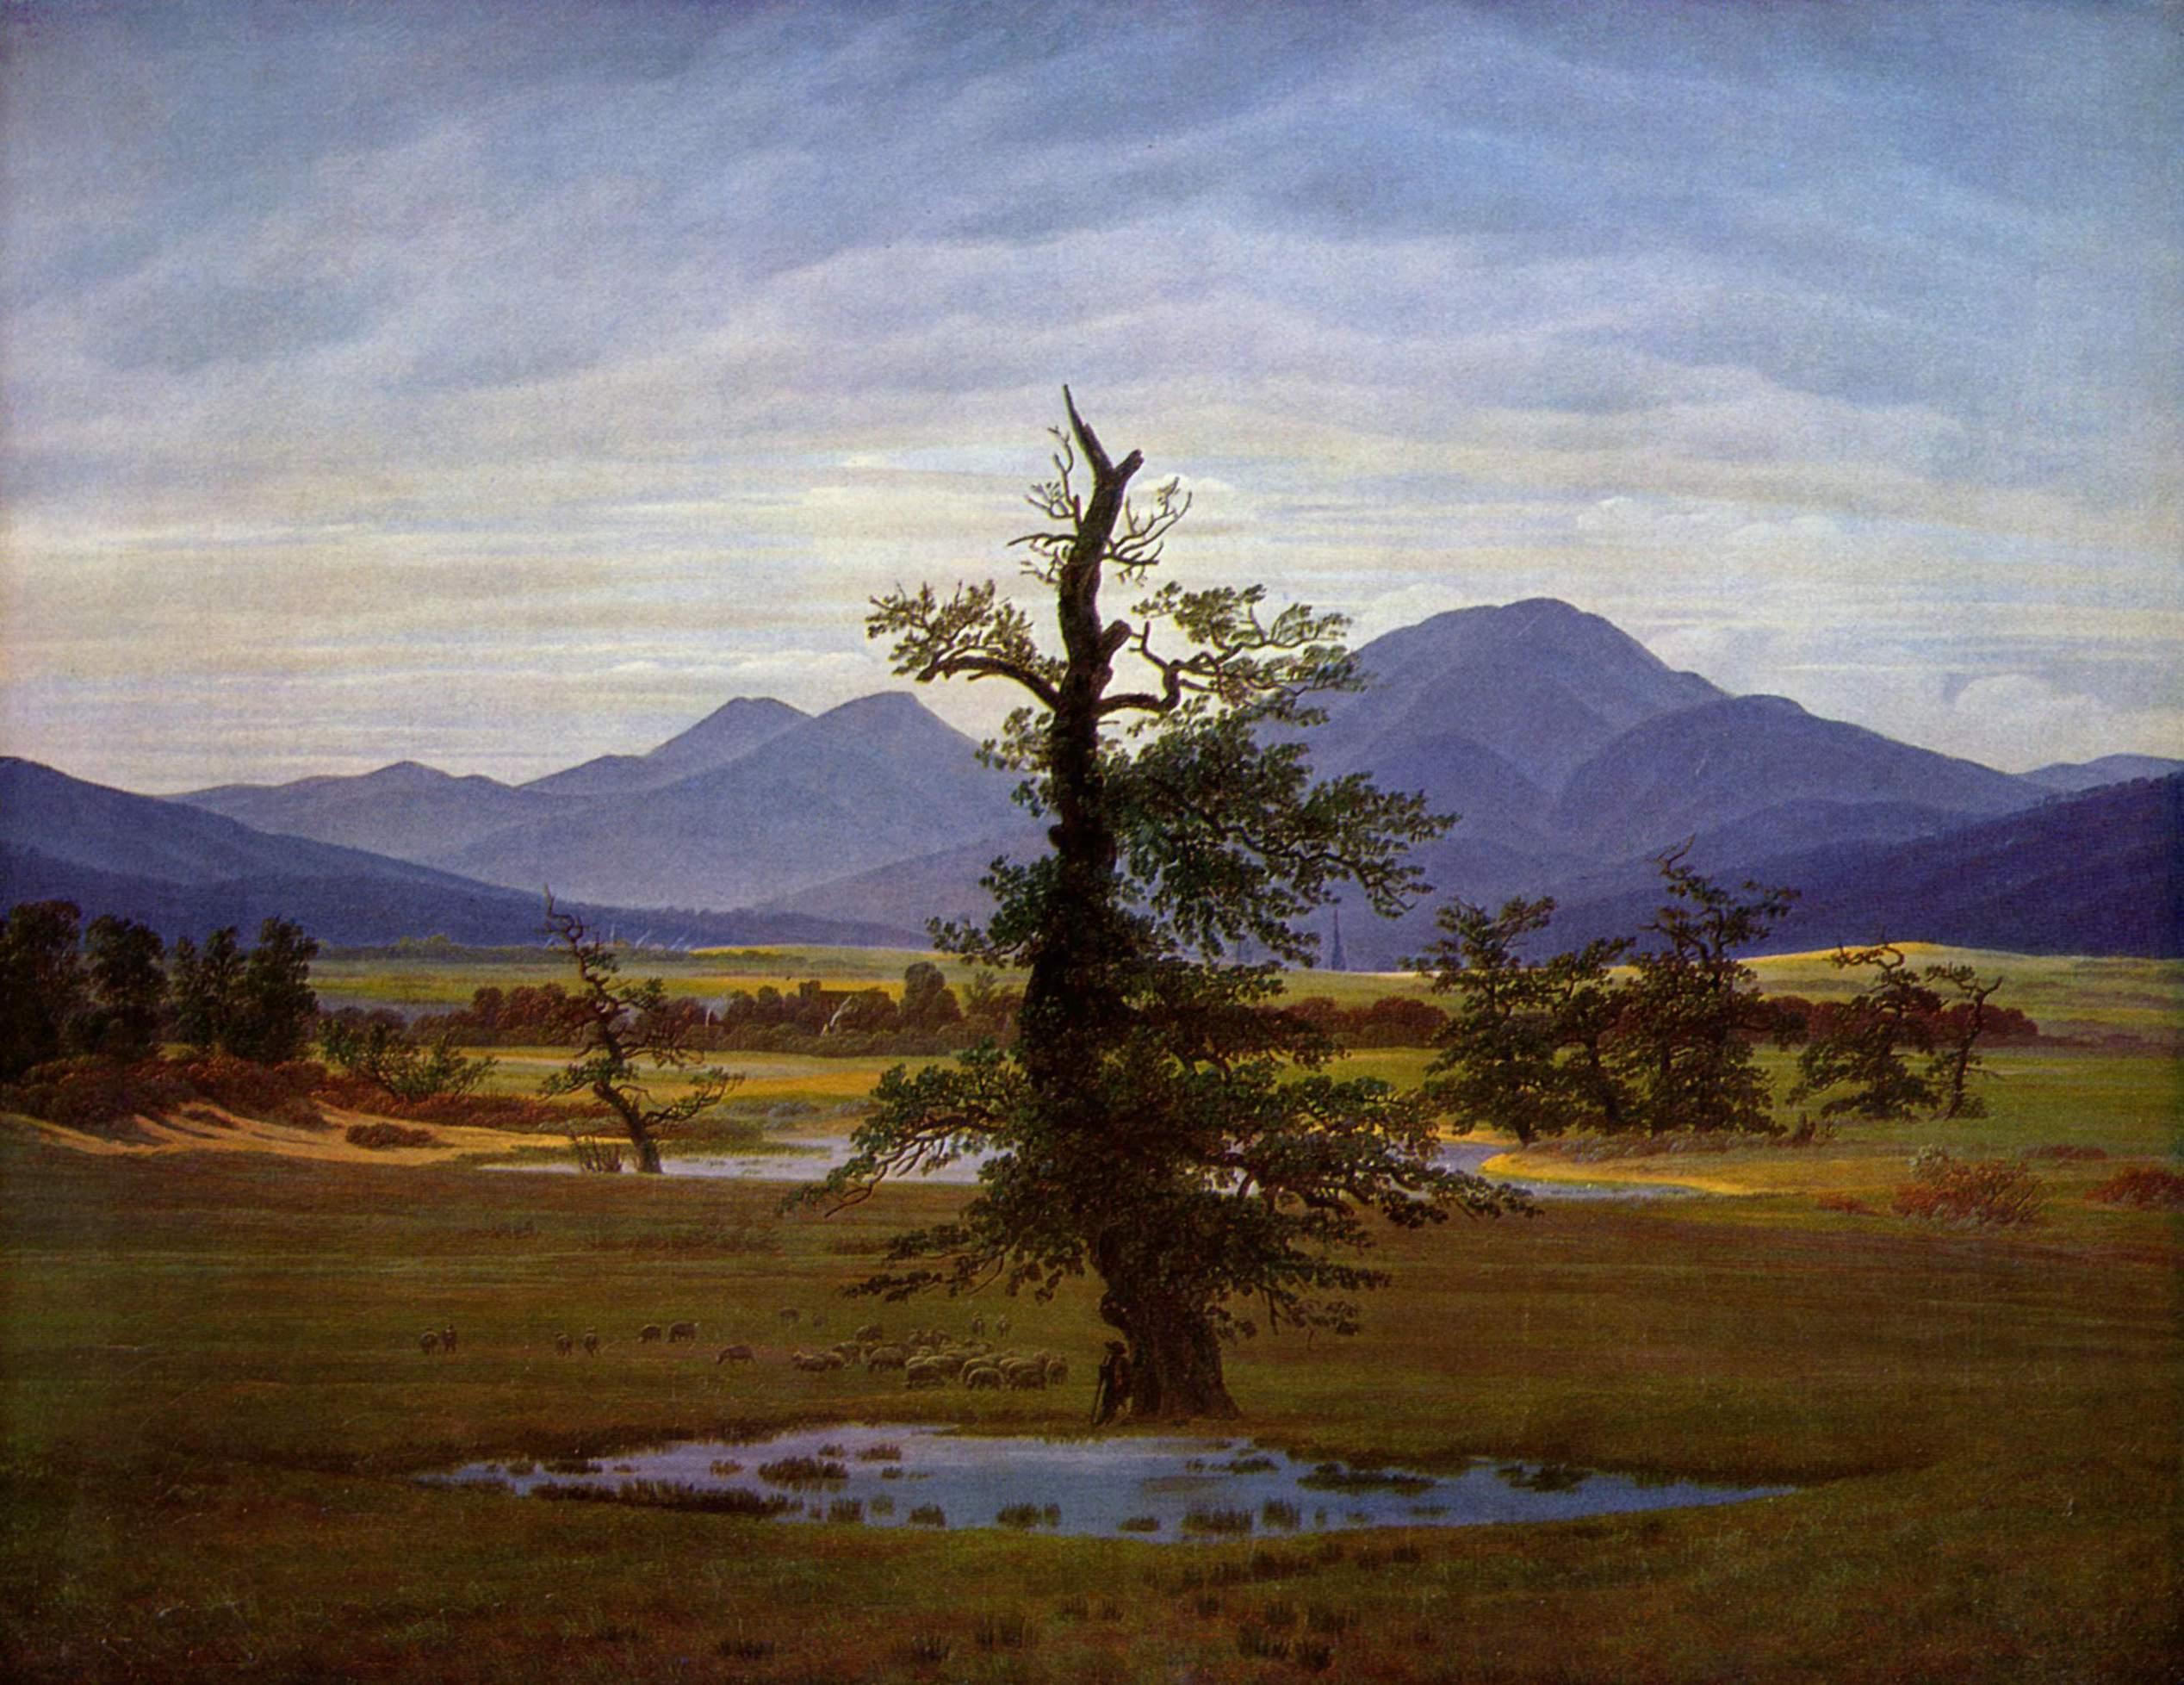 Solitary Tree, 1822 - Caspar David Friedrich - WikiArt.org